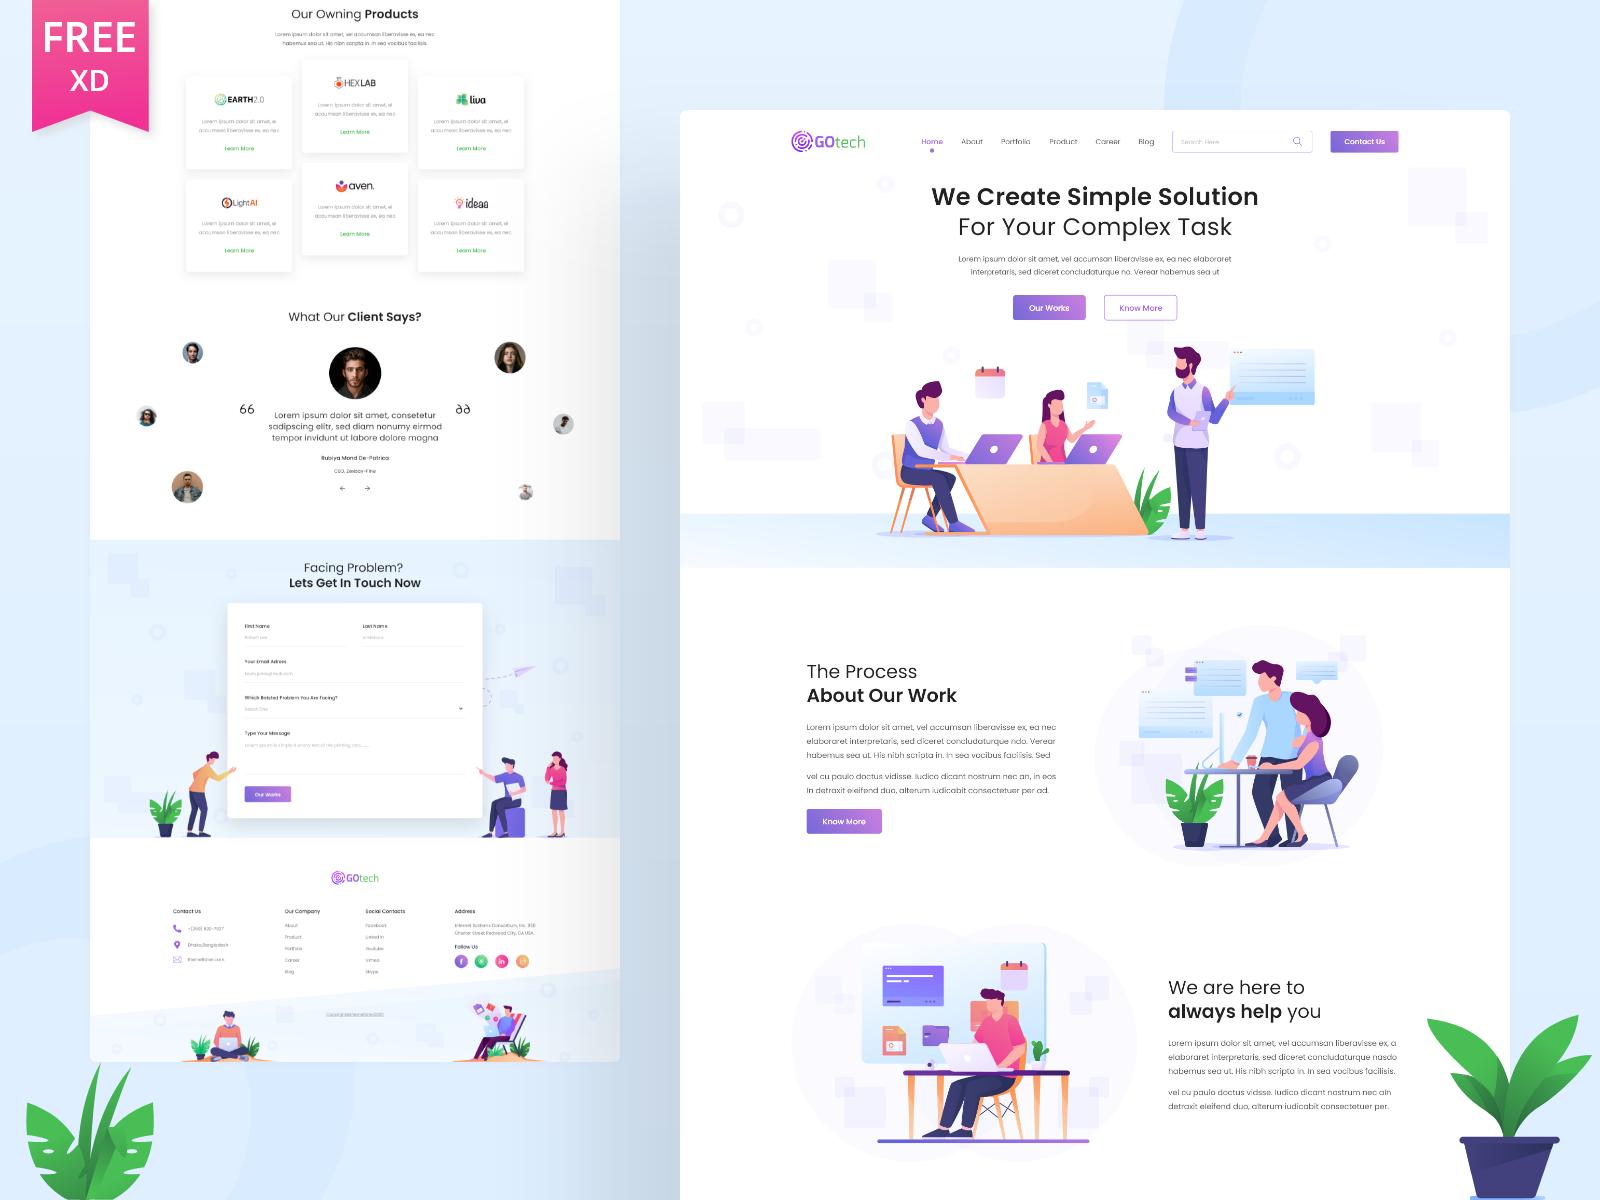 Gotech - Startup Website Free XD Template